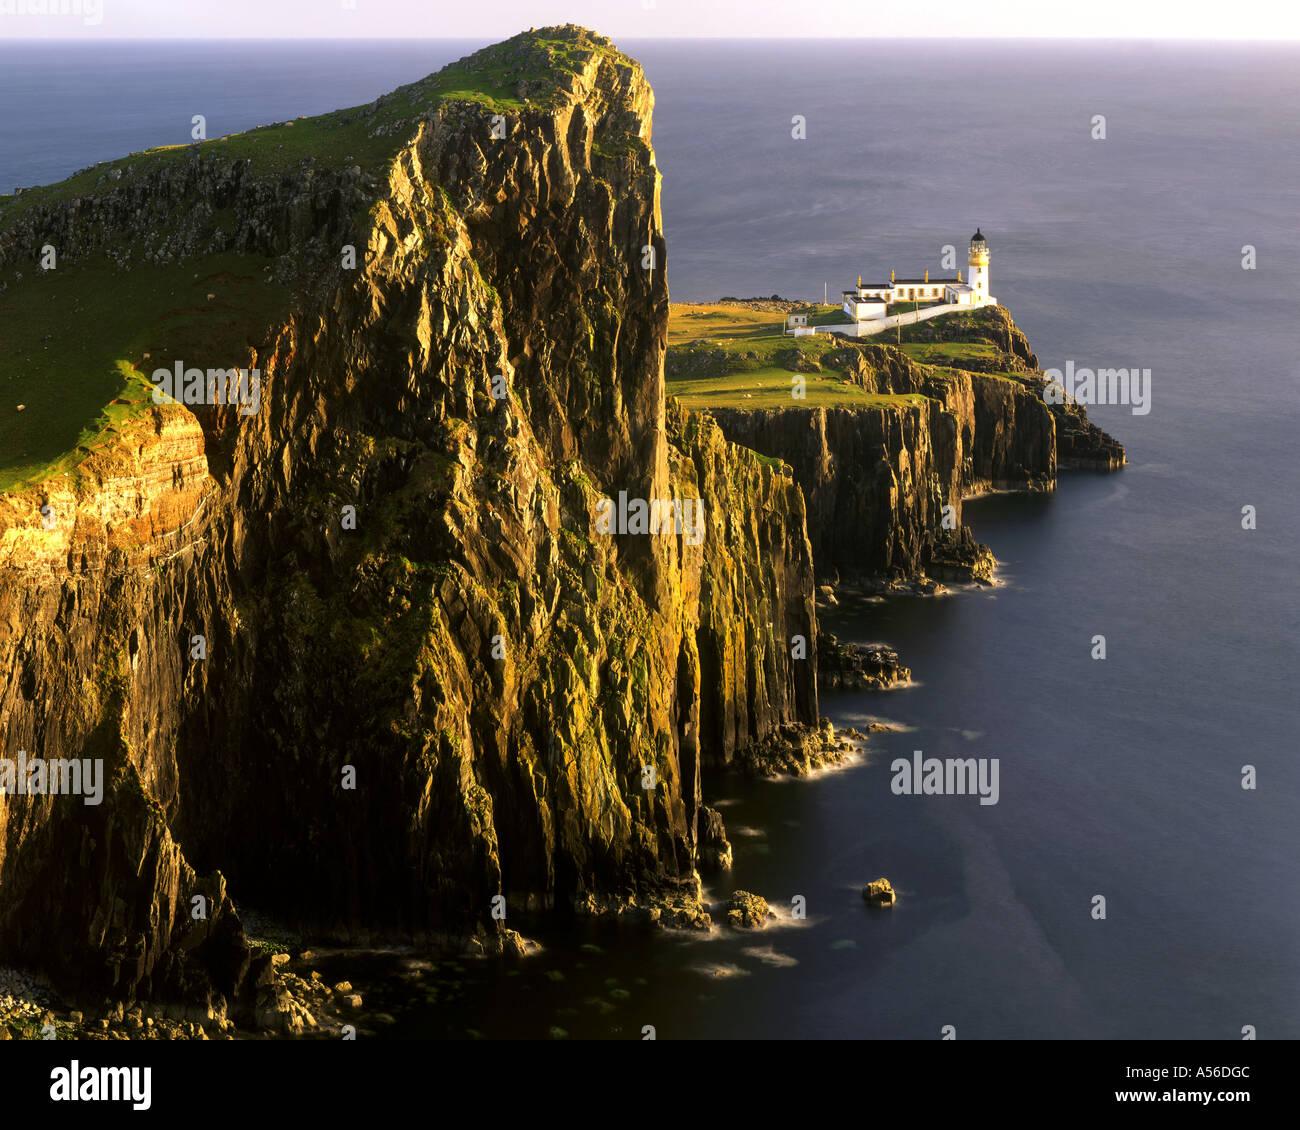 GB - Ecosse: Neist phare sur l'île de Skye Photo Stock